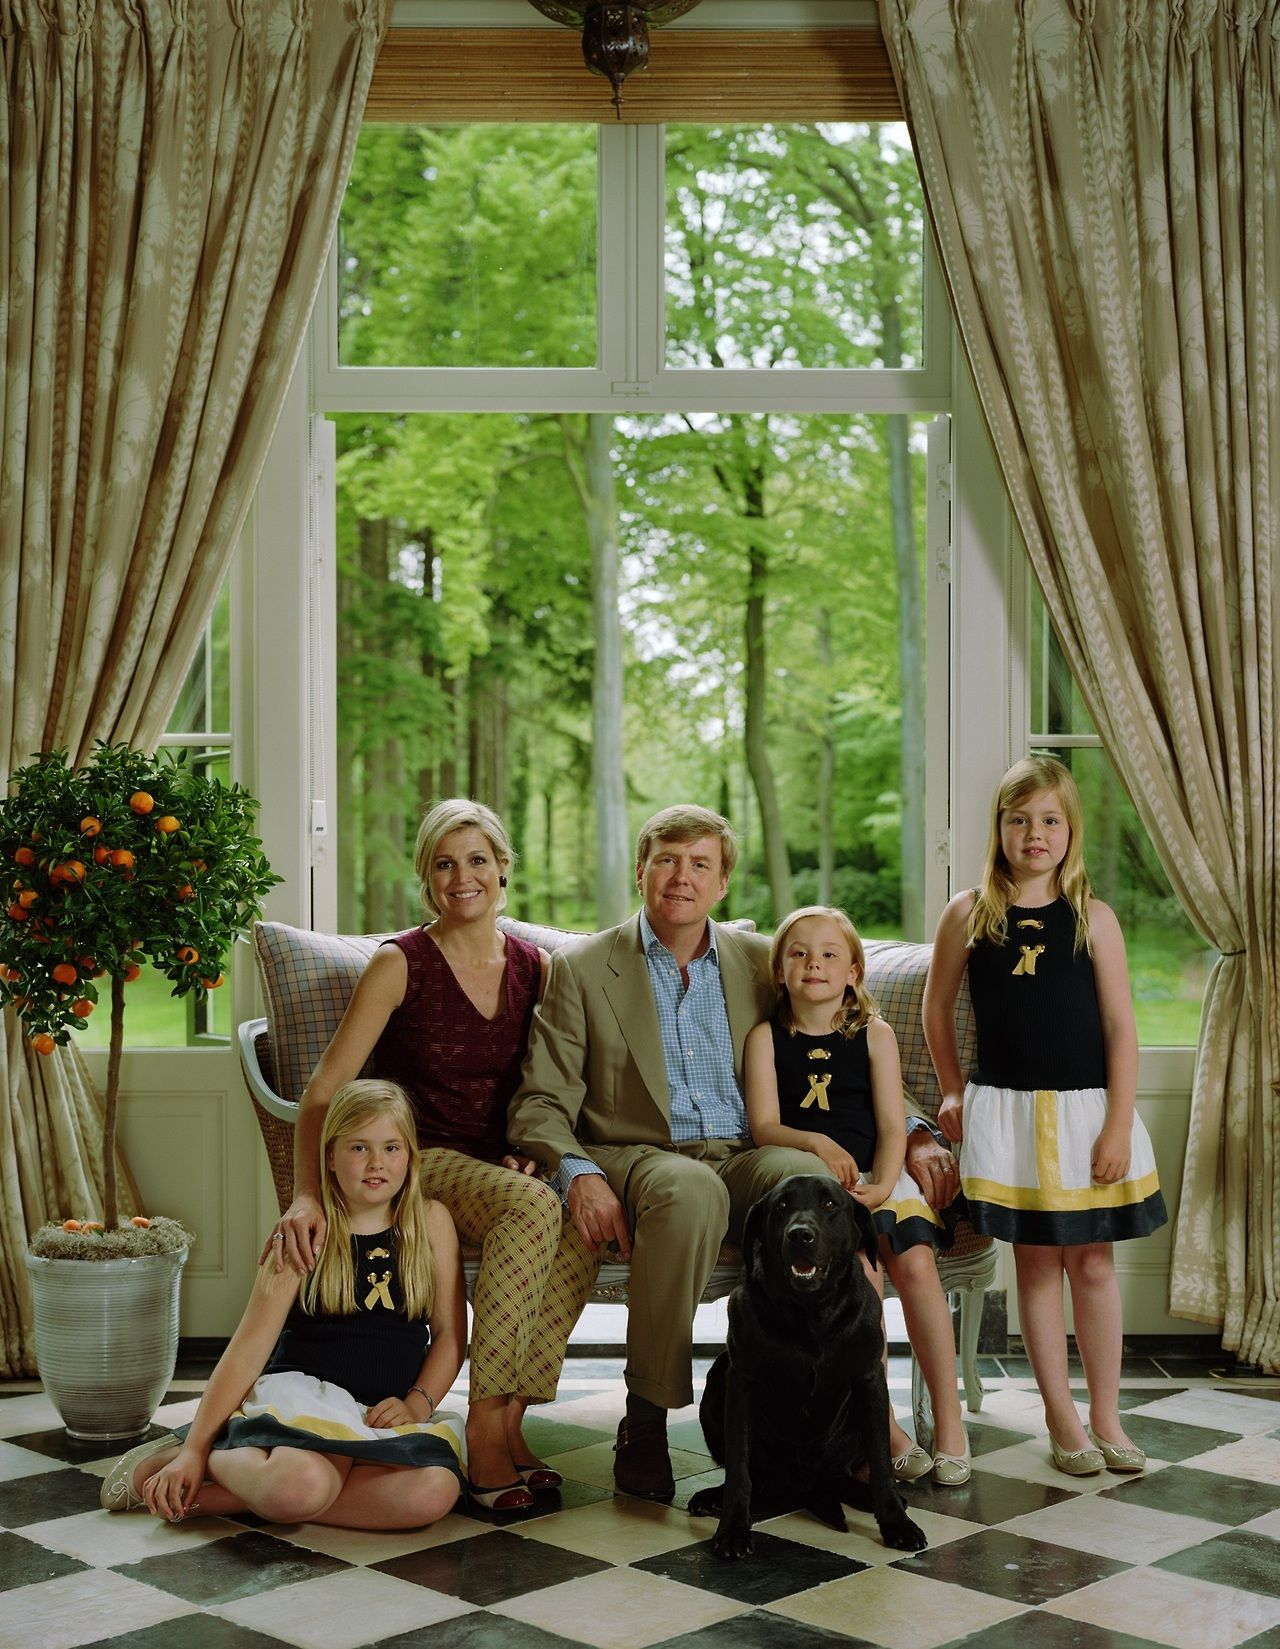 Koningin Maxima , Koning Willem-Alexander, met prinsessen Amalia,Alexia en Ariana